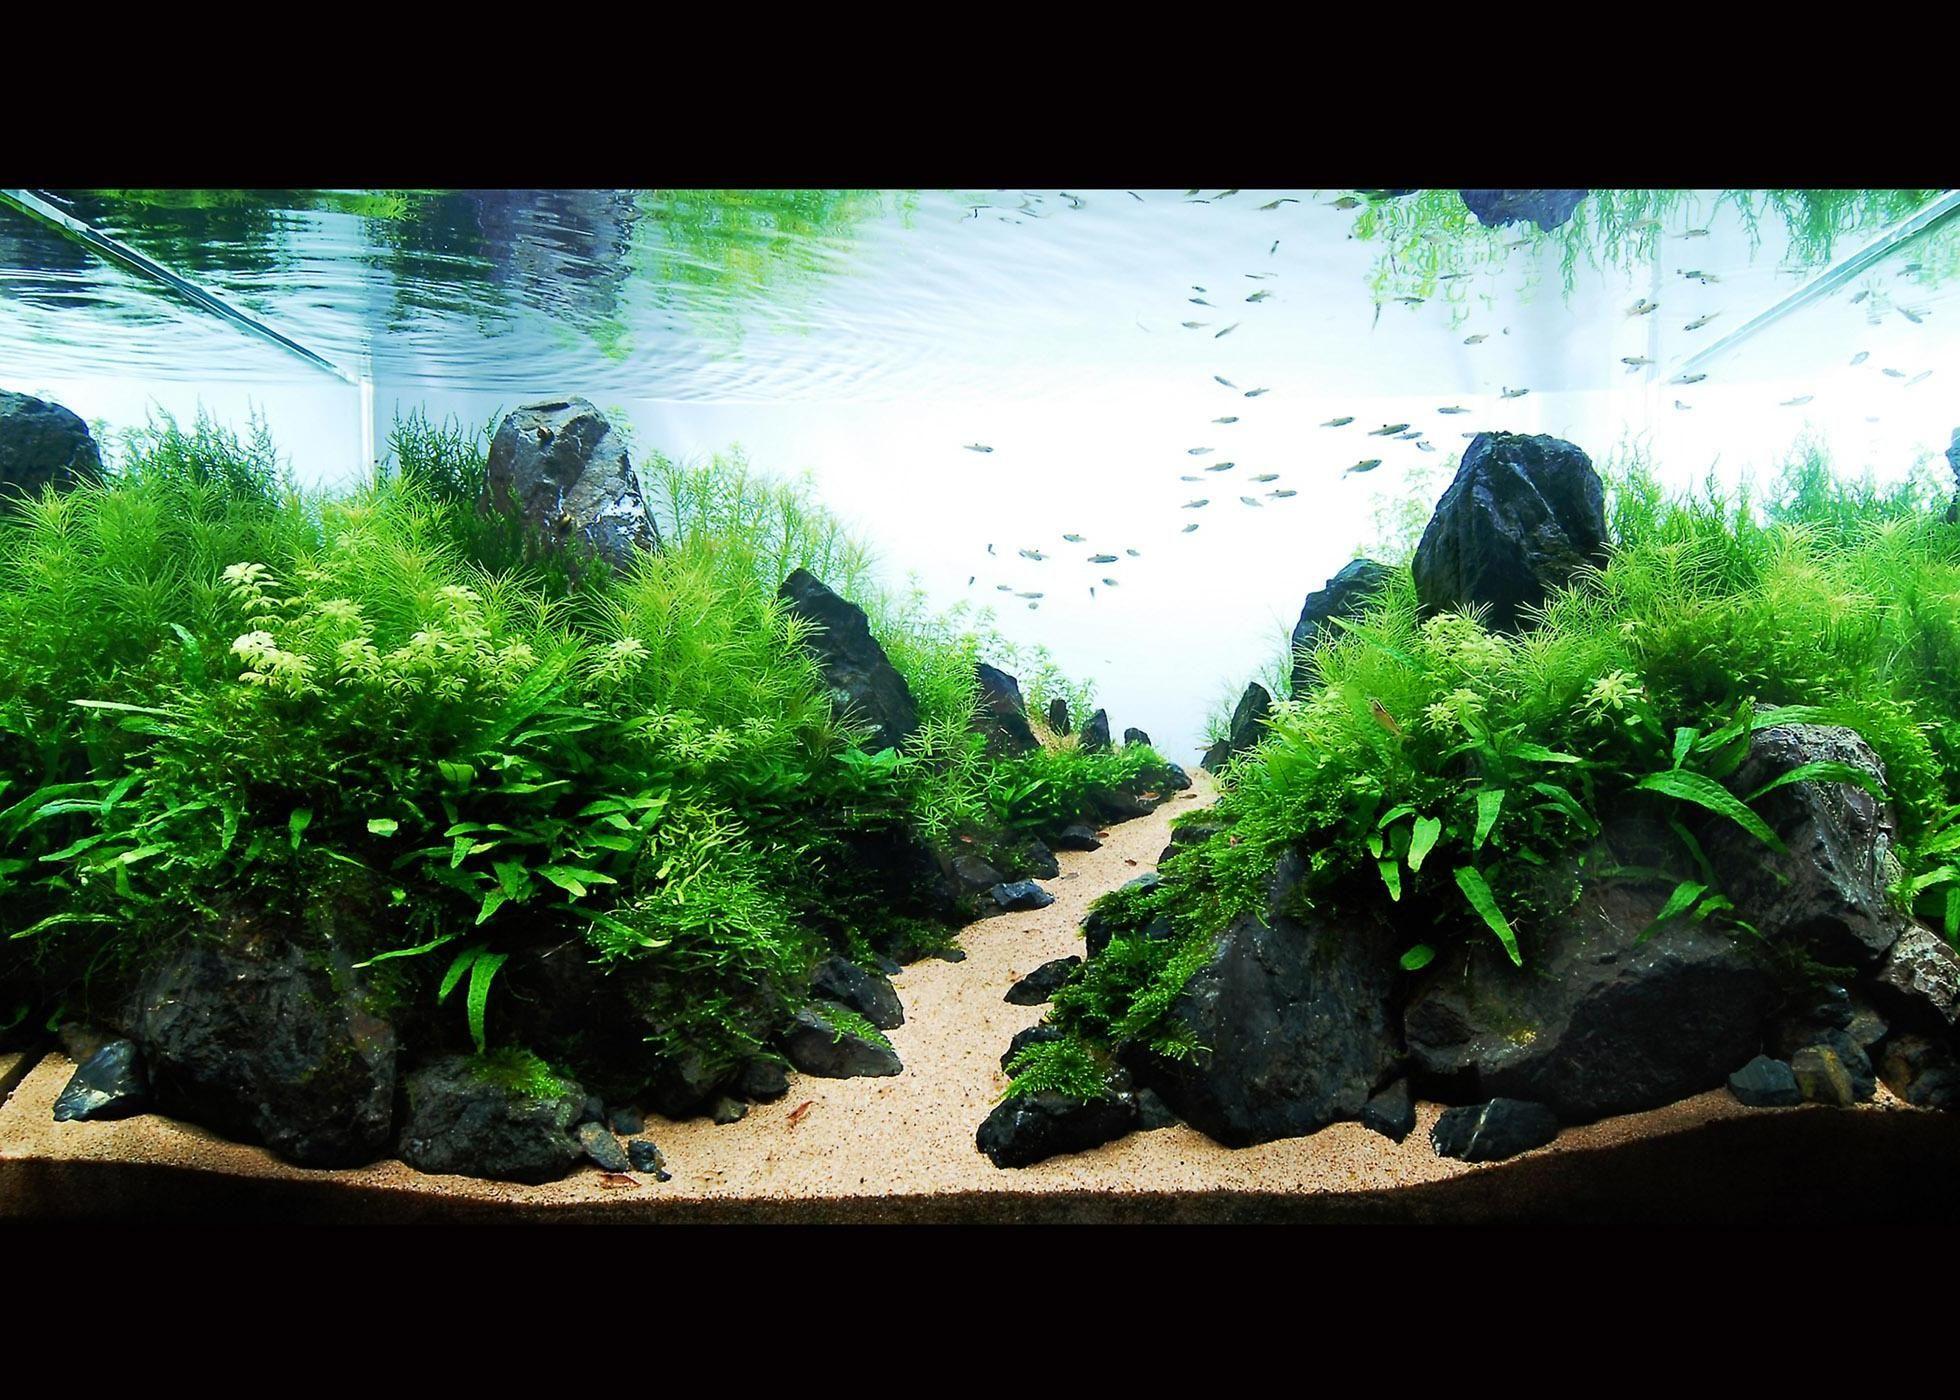 Black Natural Stone Aquascape Landscape Ideas With Sand Plus Green